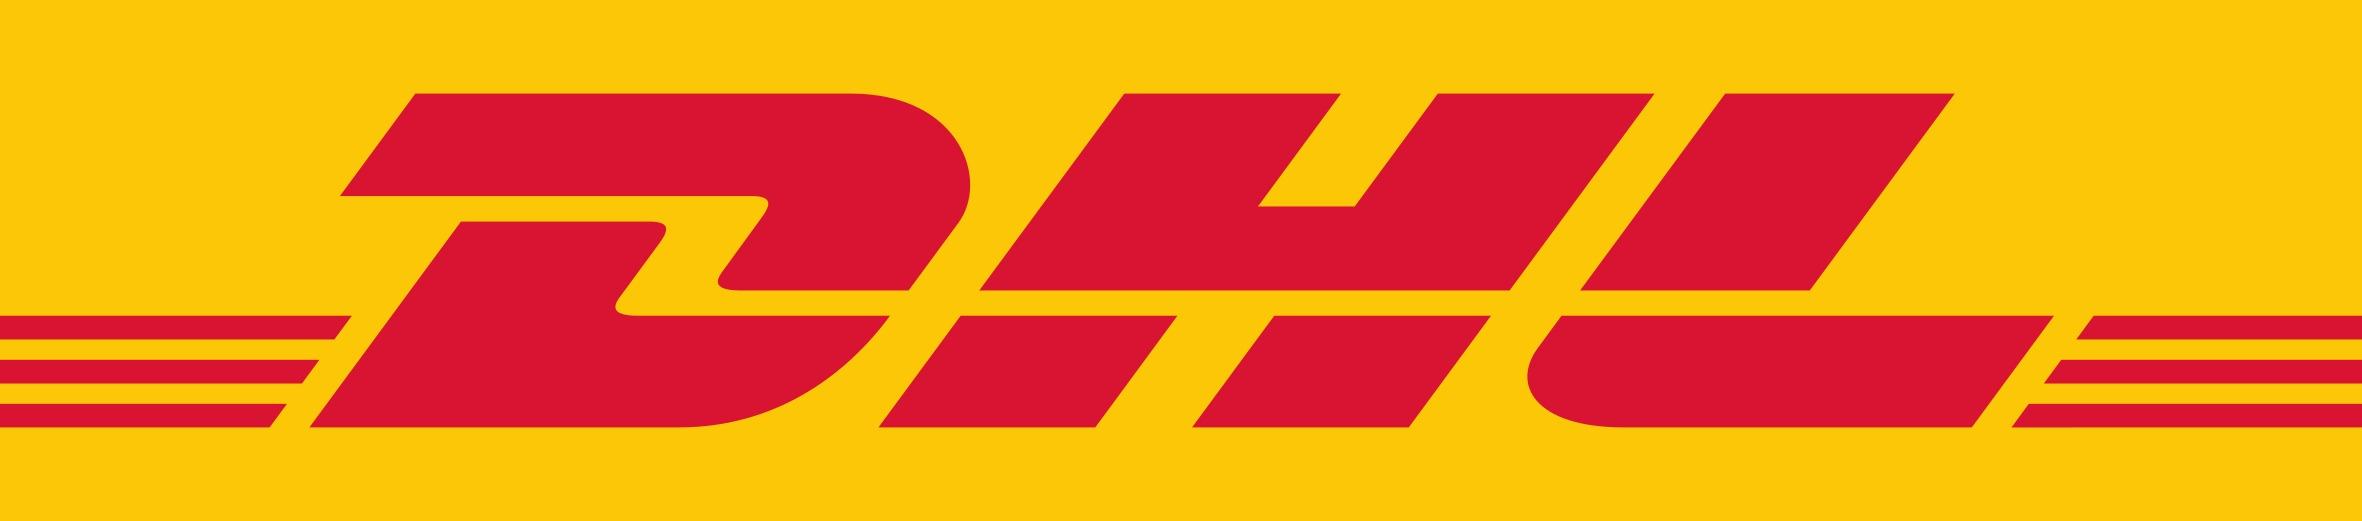 Stokmed Poznan DHL shipment